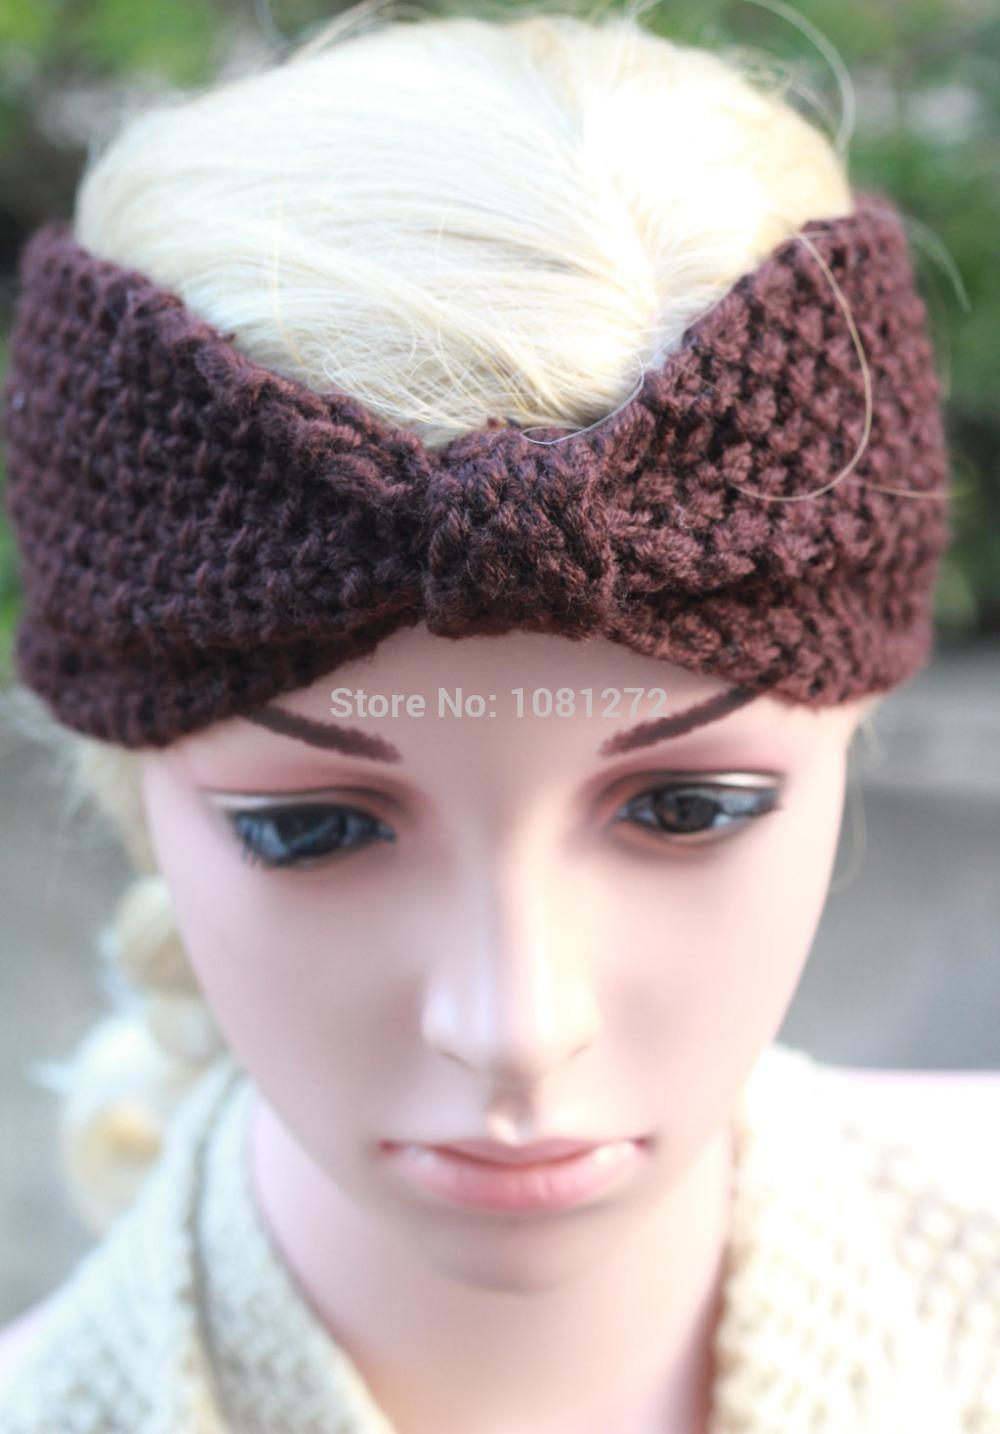 (20pieces/lot) Wholesale Head wrap,headband pattern,Kont Knit Headband Brown headband fashion headband Cute Turban 7013(China (Mainland))